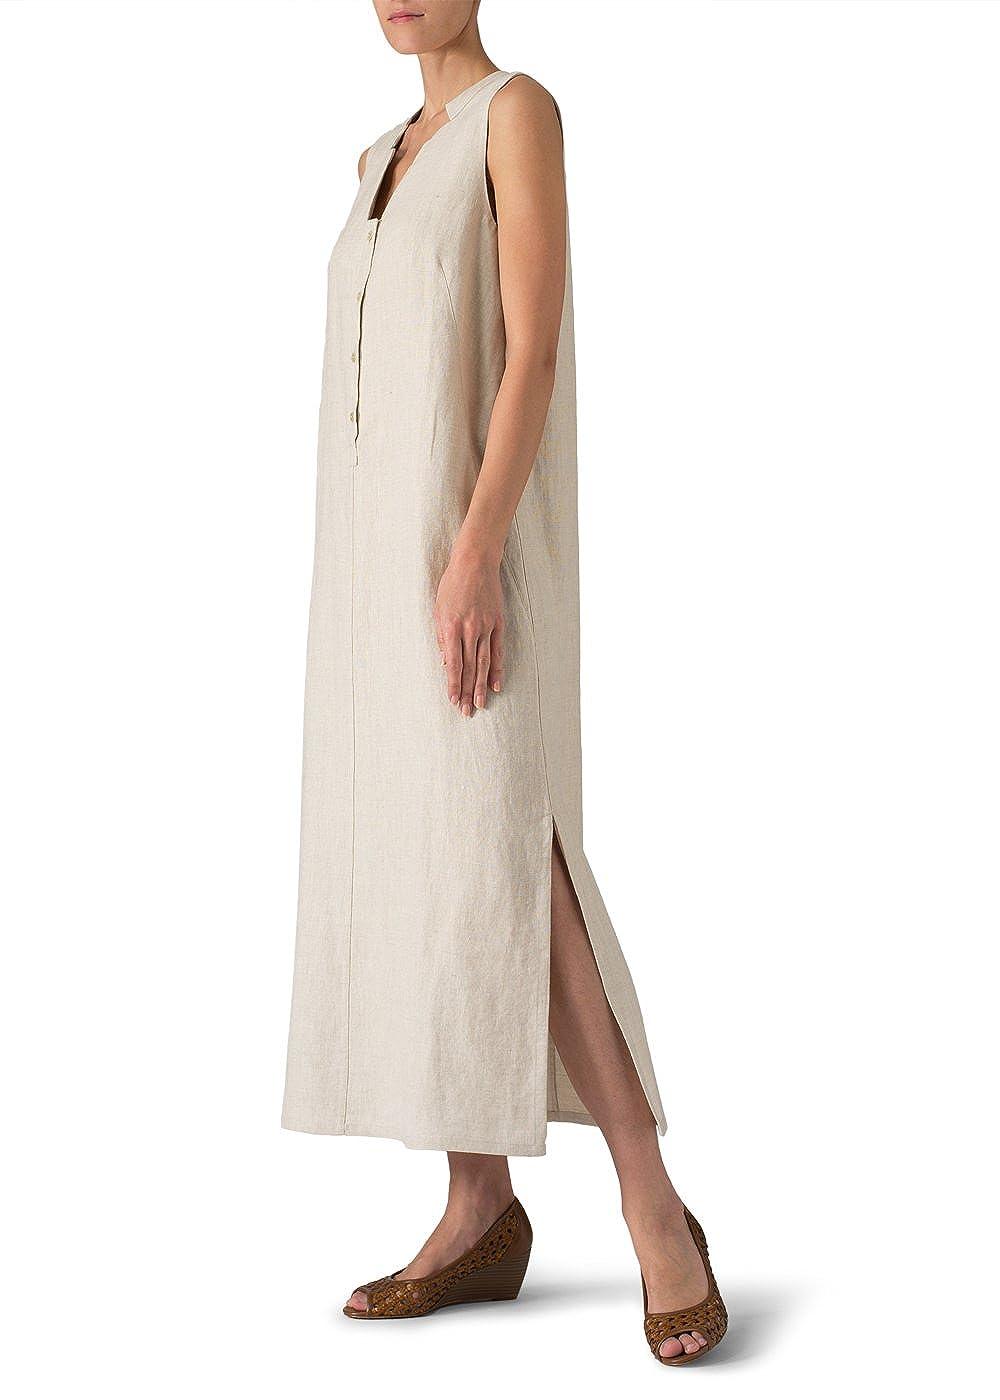 5353db3575 Vivid Linen Sleeveless Slip-on Dress at Amazon Women s Clothing store